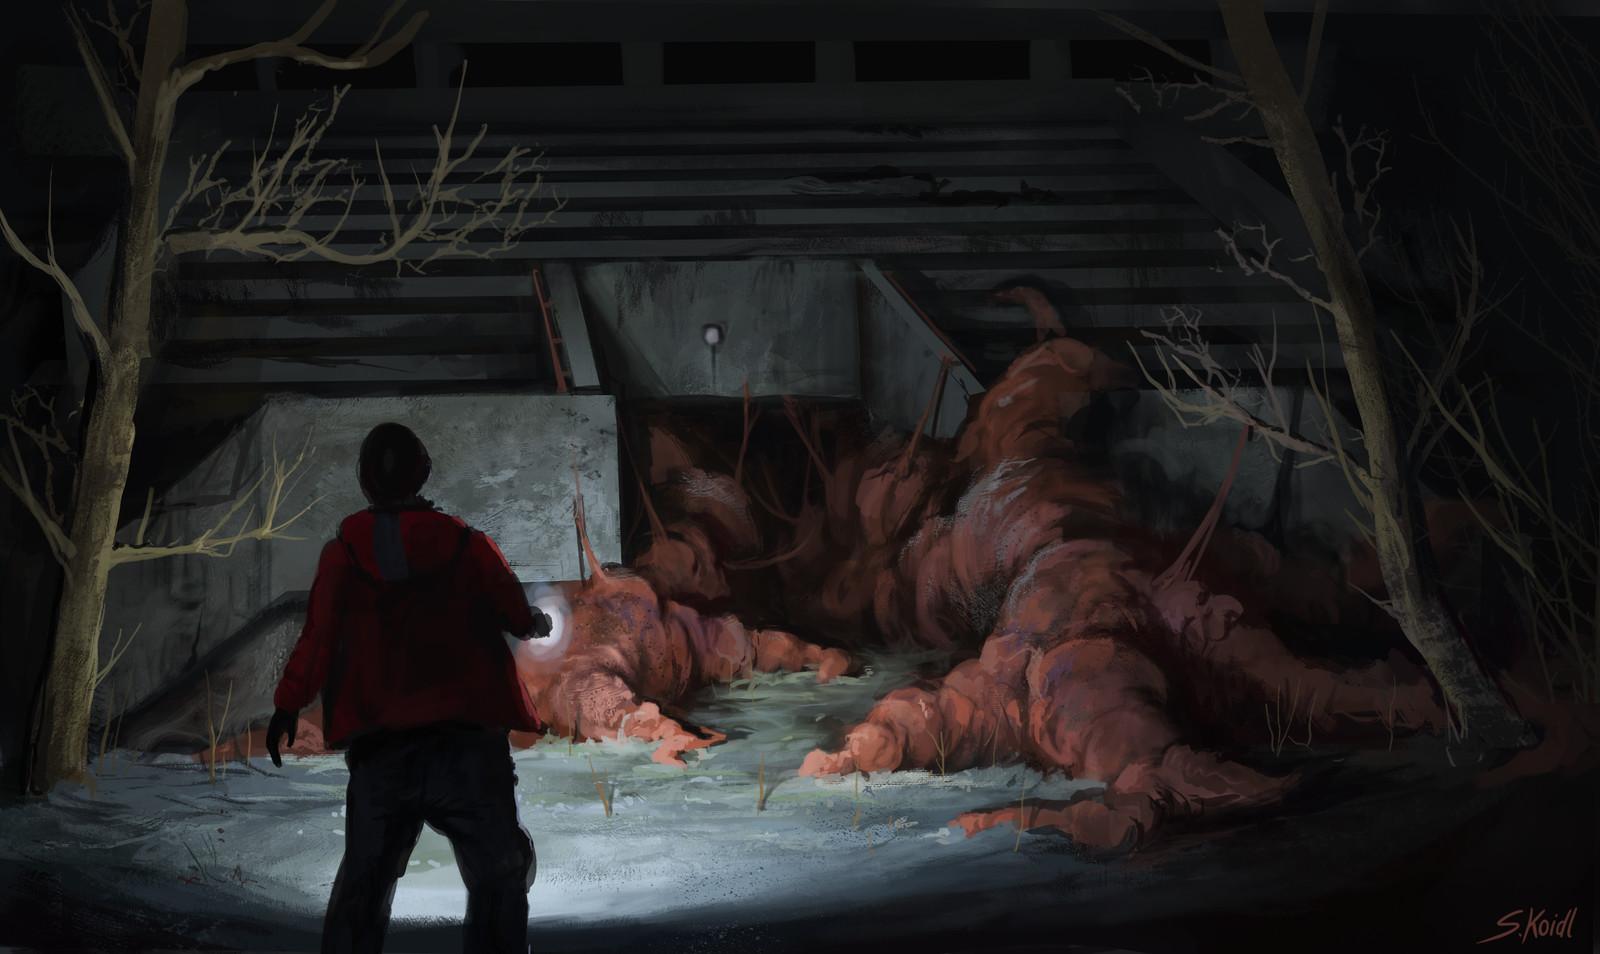 A Chernobyl Horror Story 5